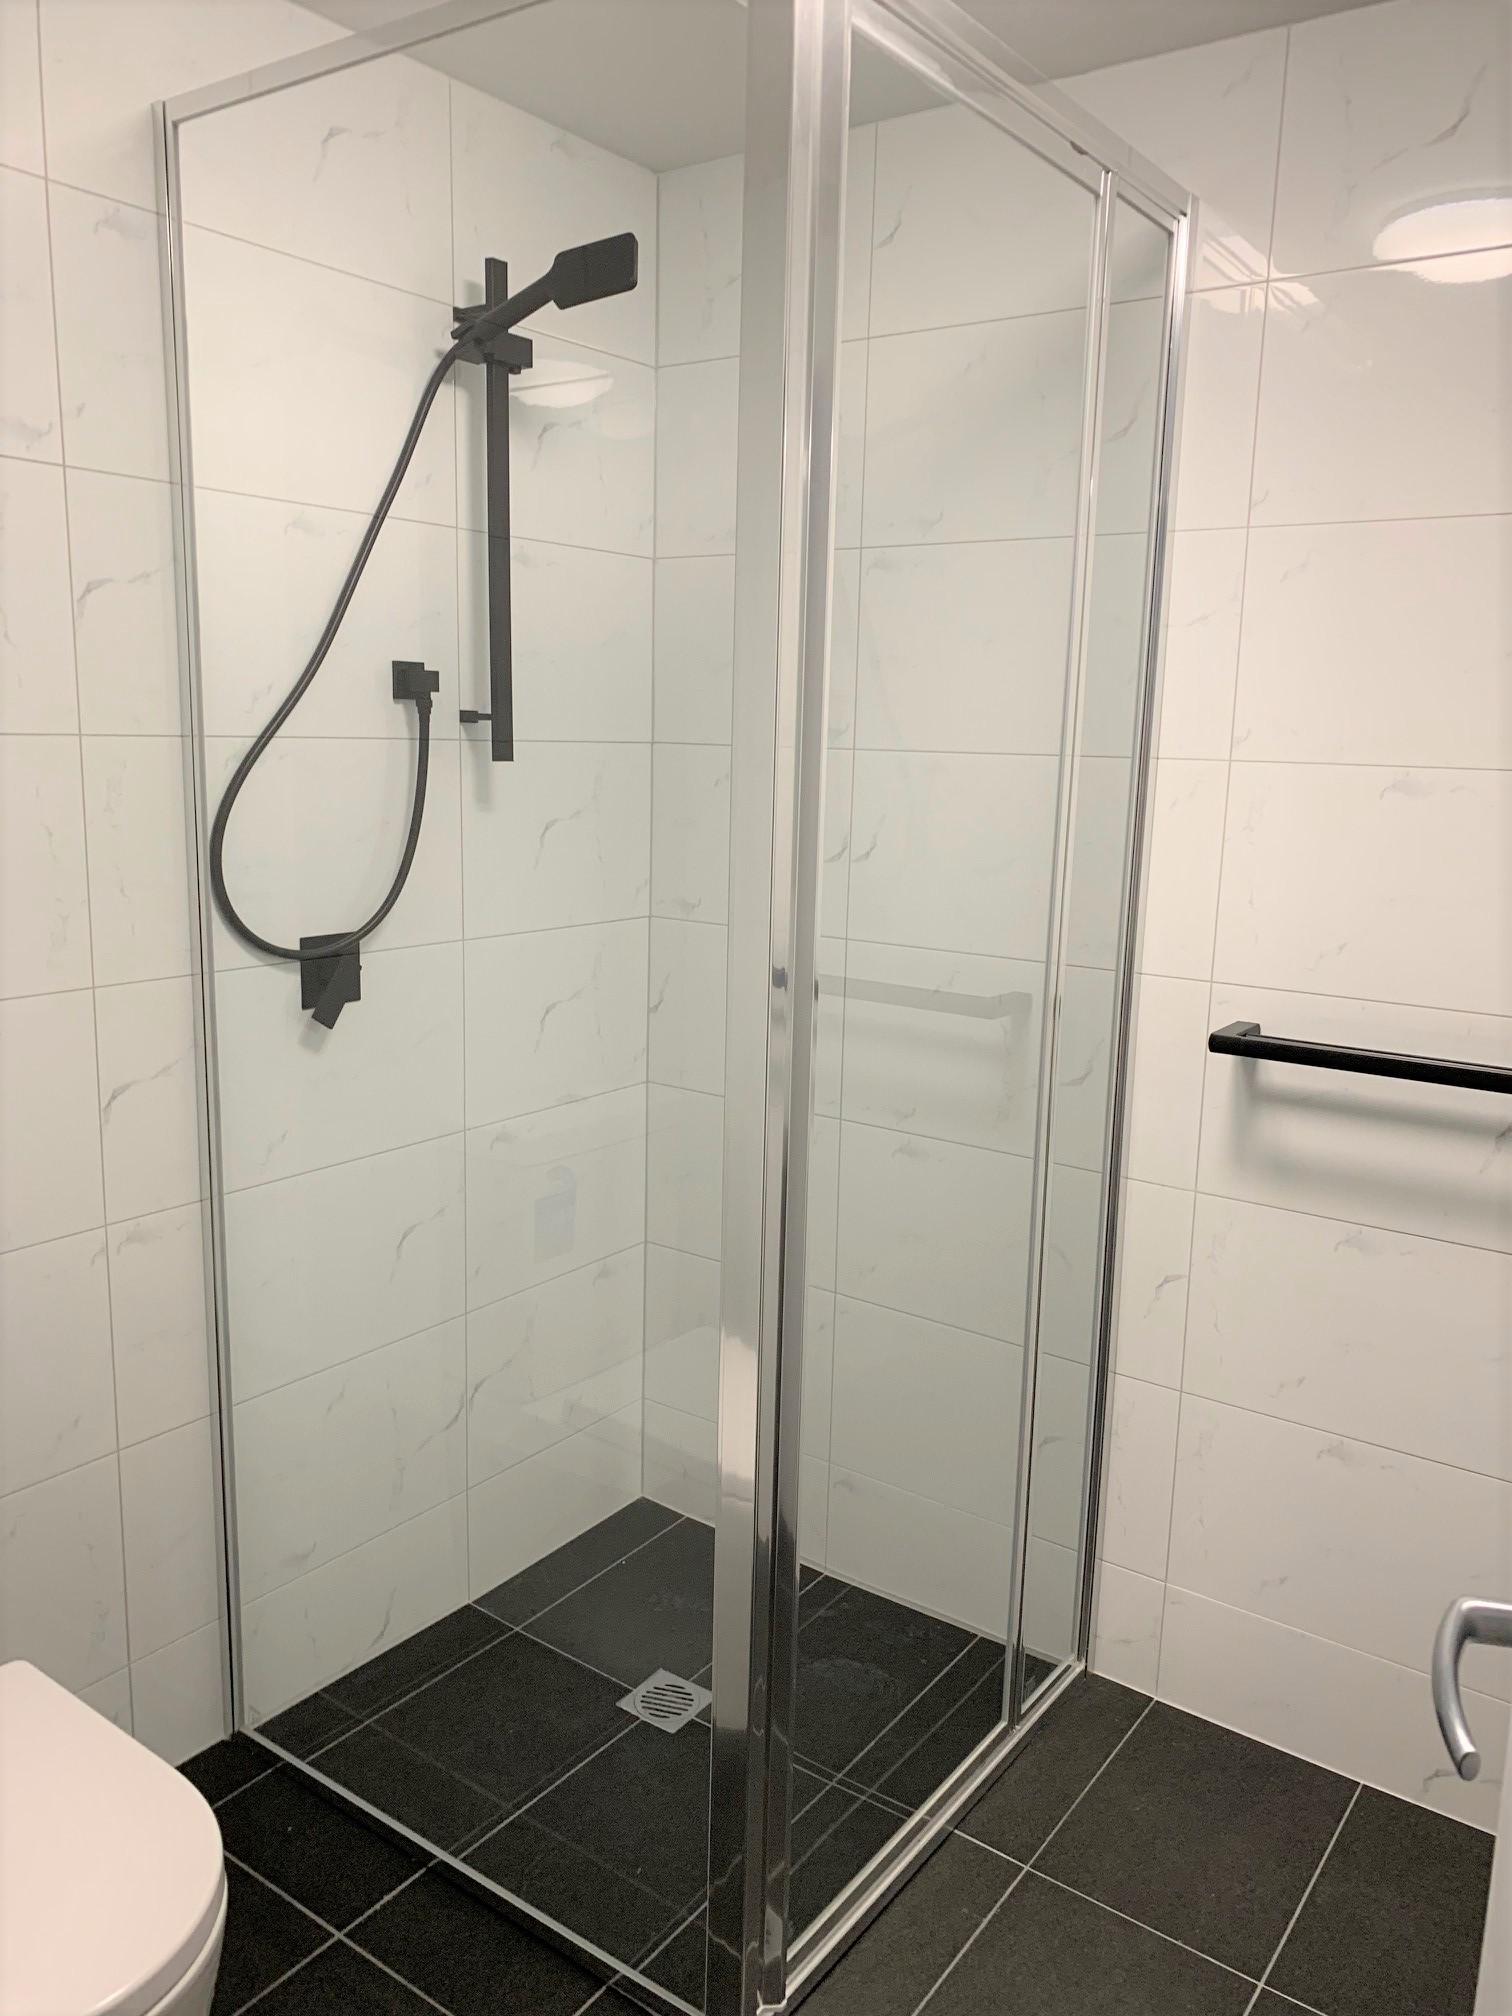 mydimport-1596538635-hires.2067-bathroom.jpg